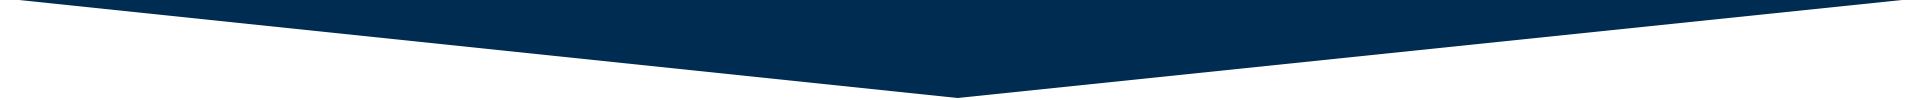 blue-divider-bottom